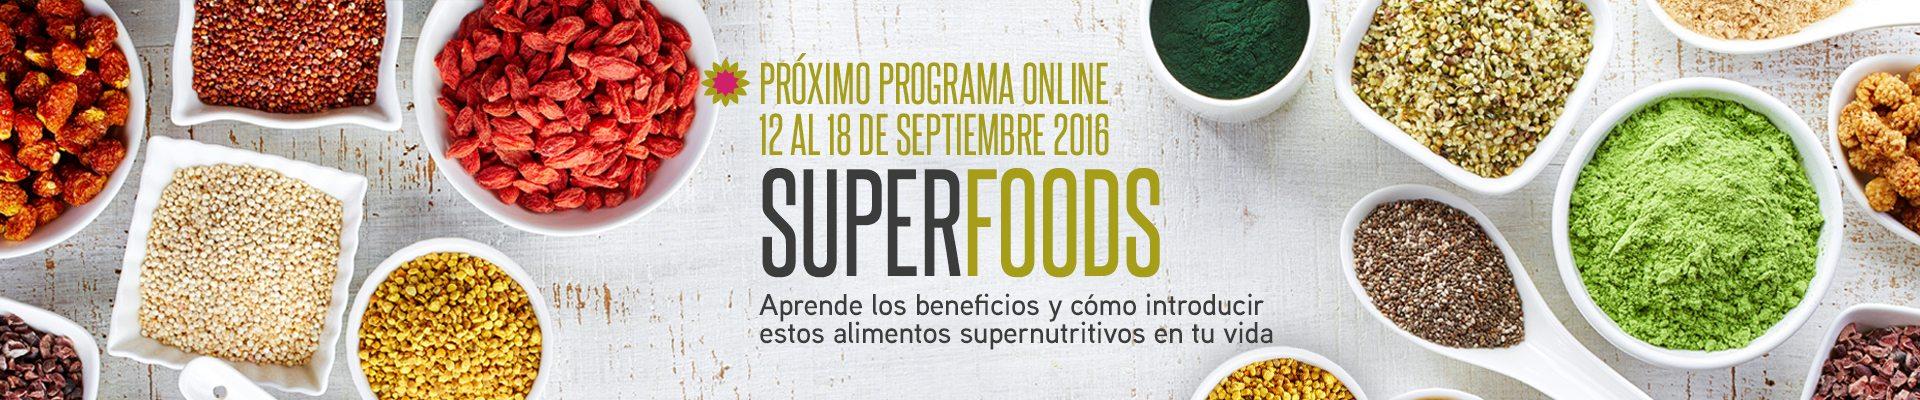 CARLA-ZAPLANA-SUPERFOODS-1920X400_SEPT16